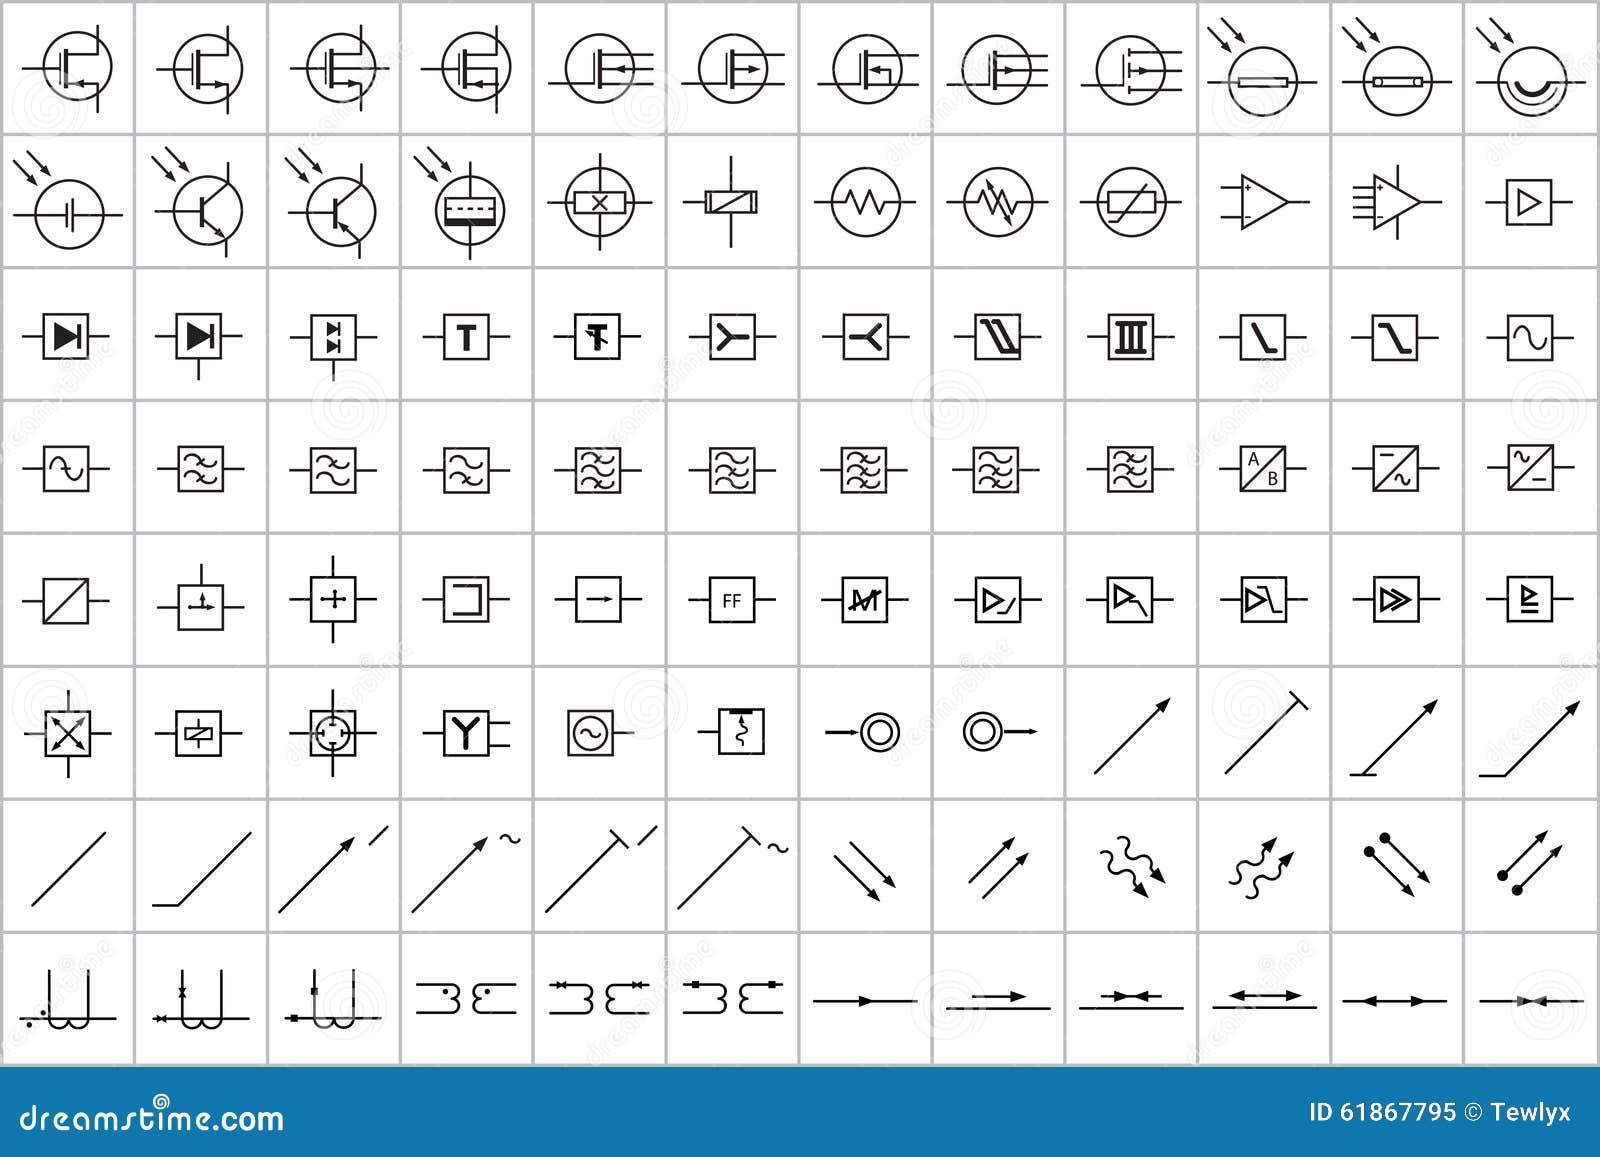 96 simboli elettronici ed elettrici v 3 immagine stock for Dwg simboli elettrici